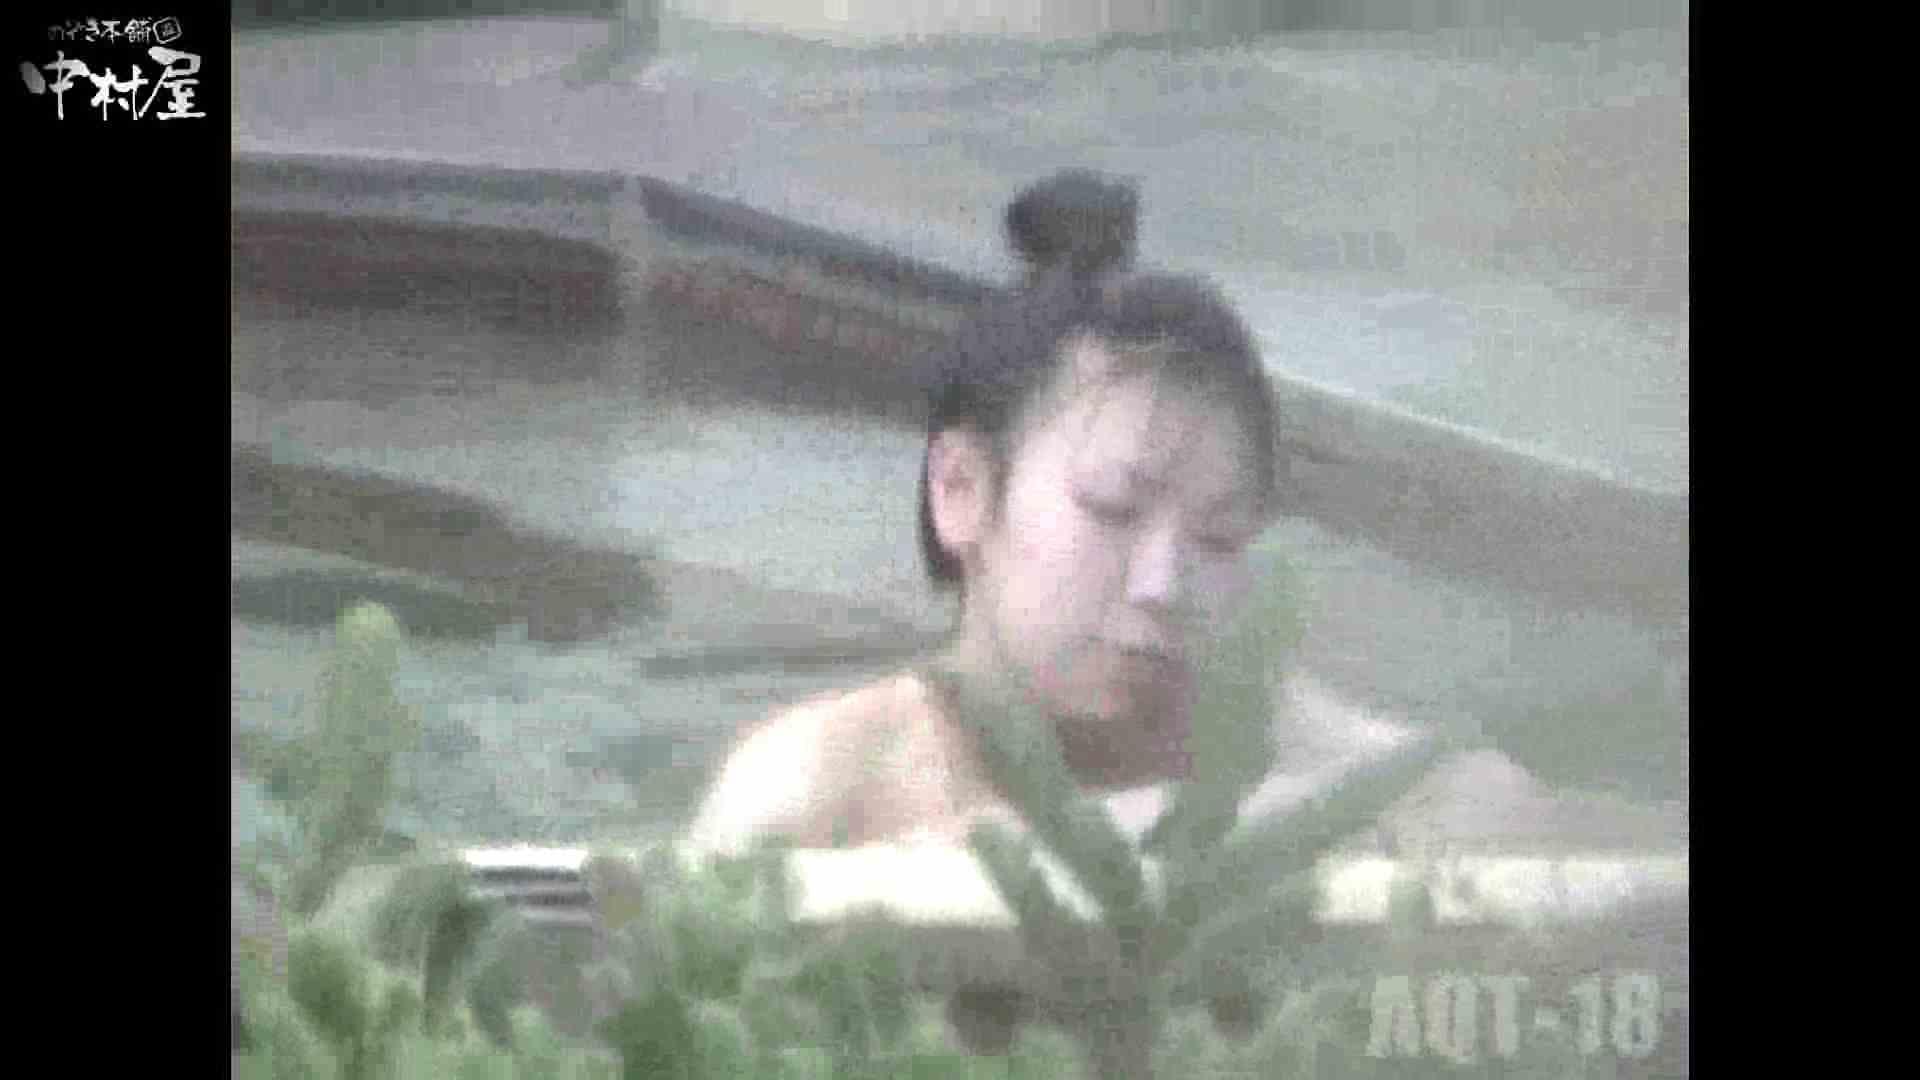 Aquaな露天風呂Vol.882潜入盗撮露天風呂十八判湯 其の二 OLセックス  90画像 64